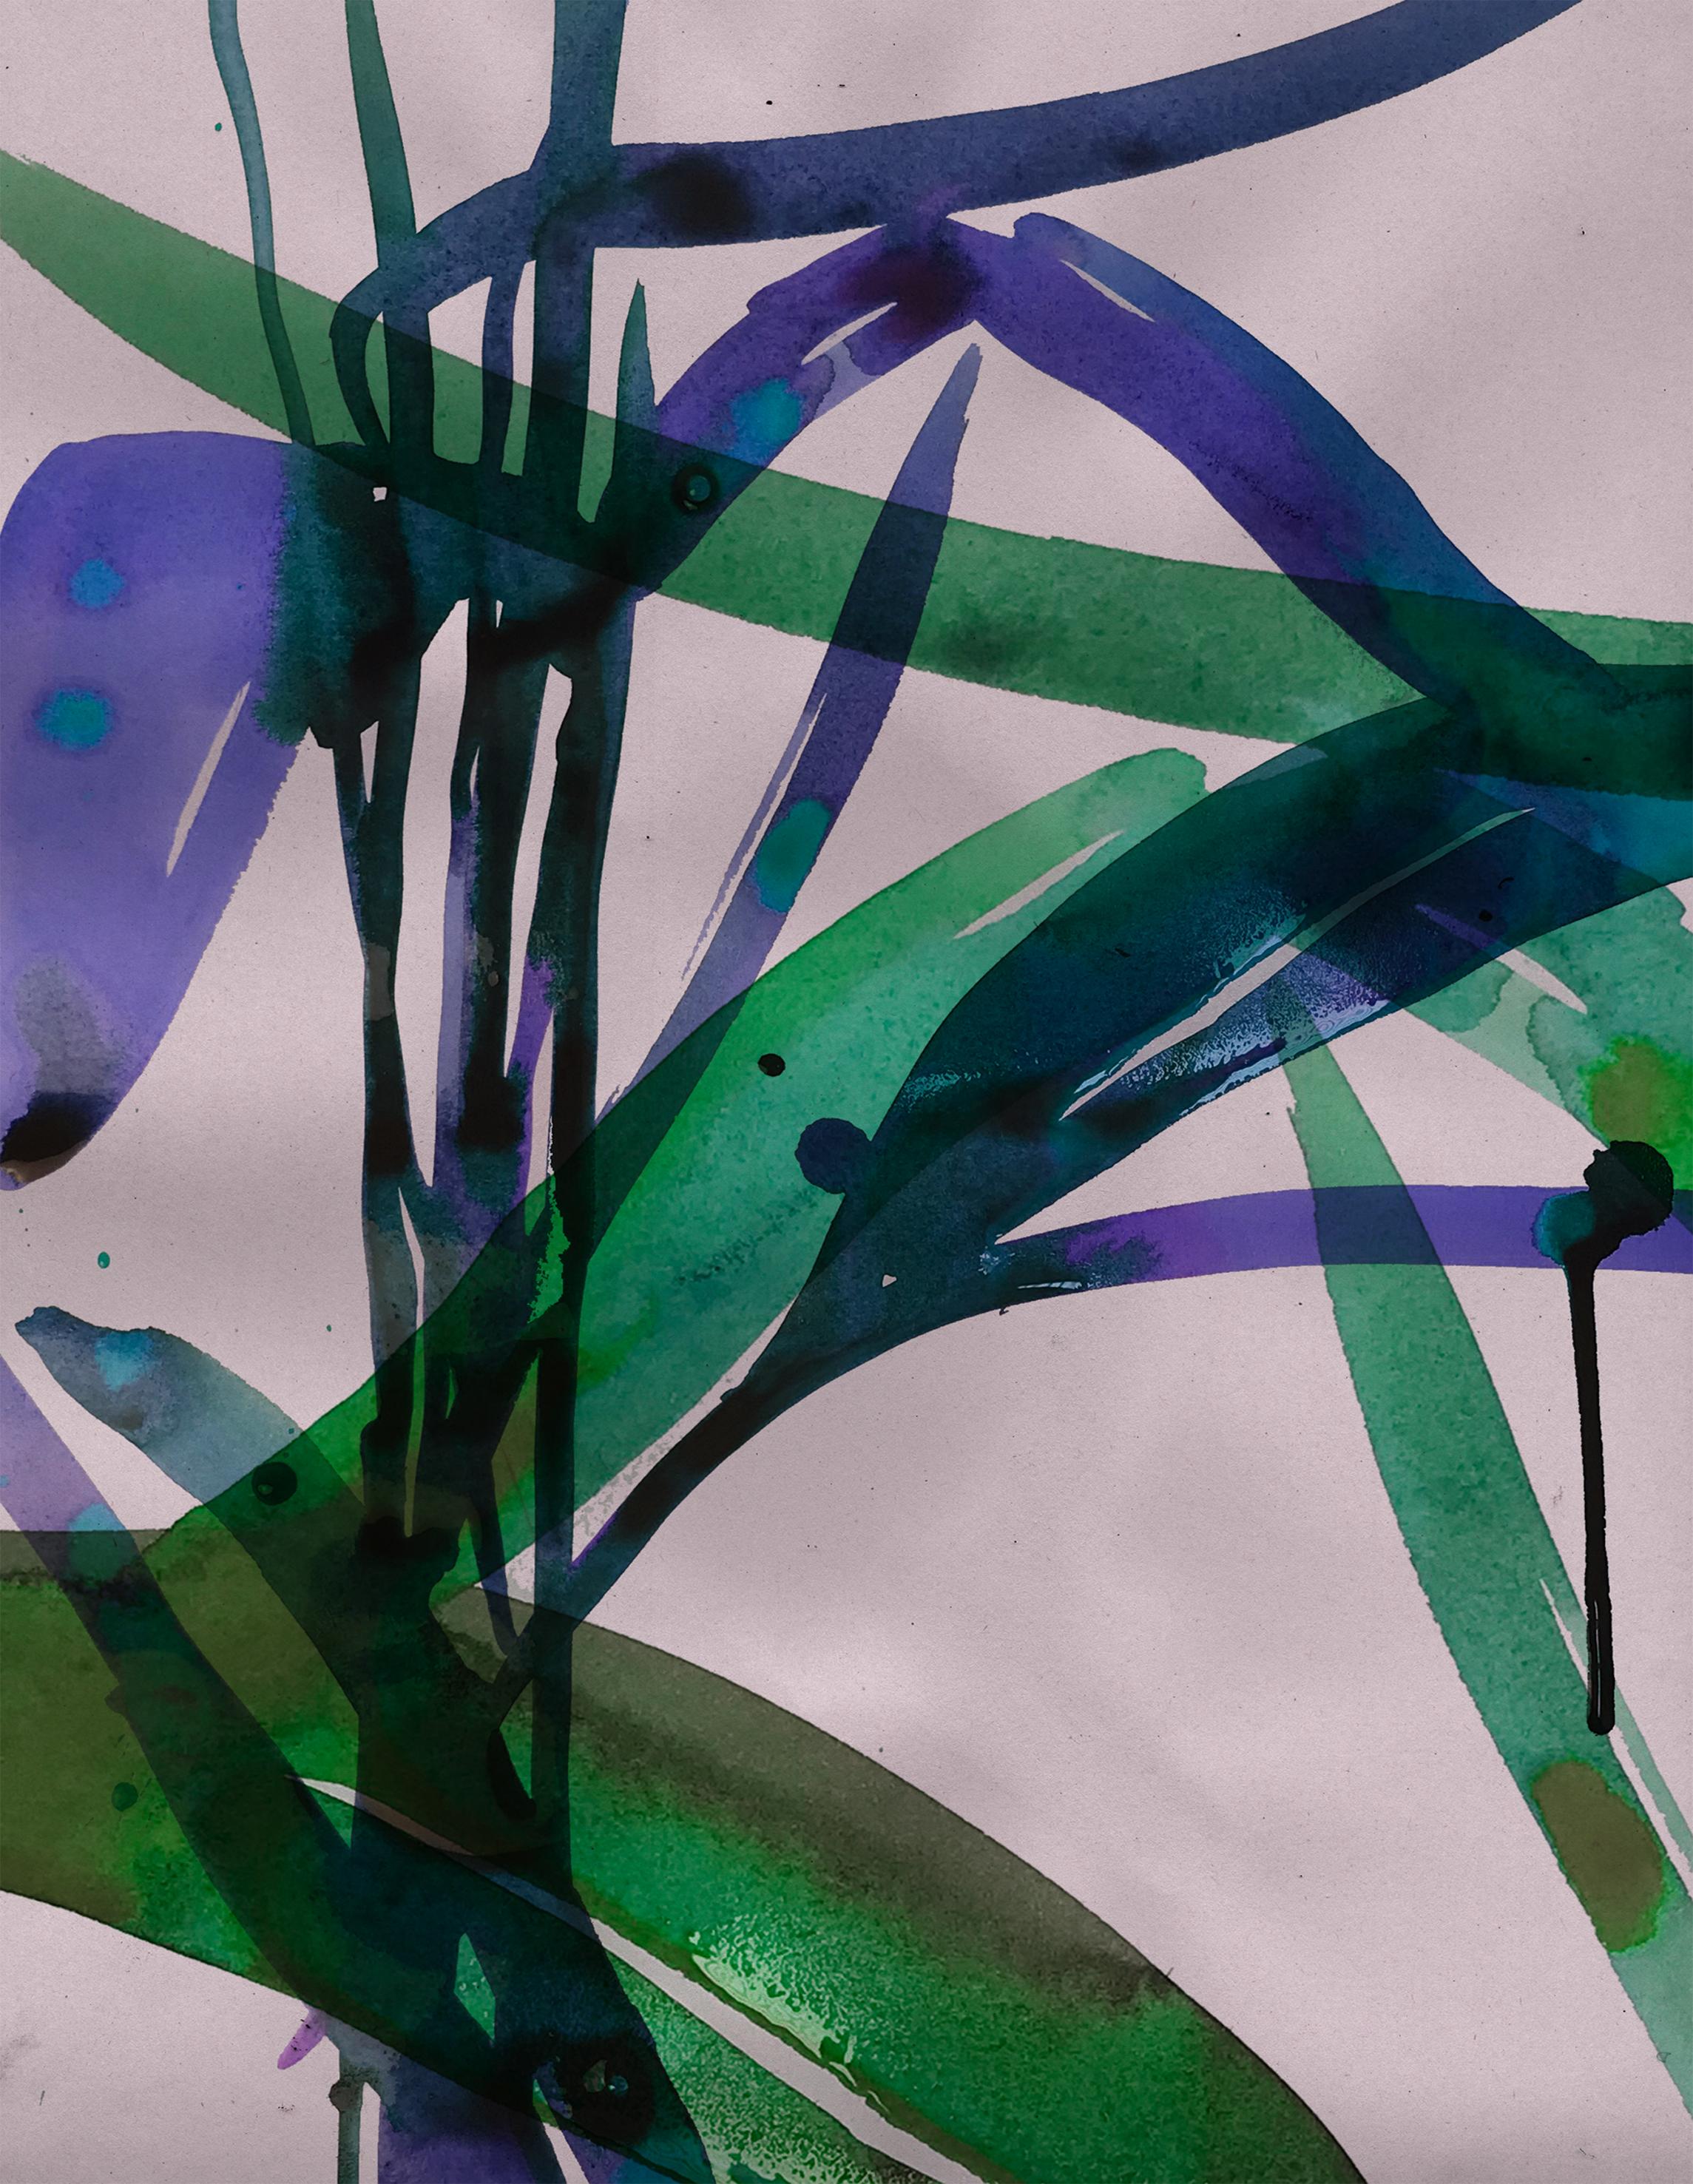 stina-persson-illustration-watercolor-lagom-design-reeds.jpg